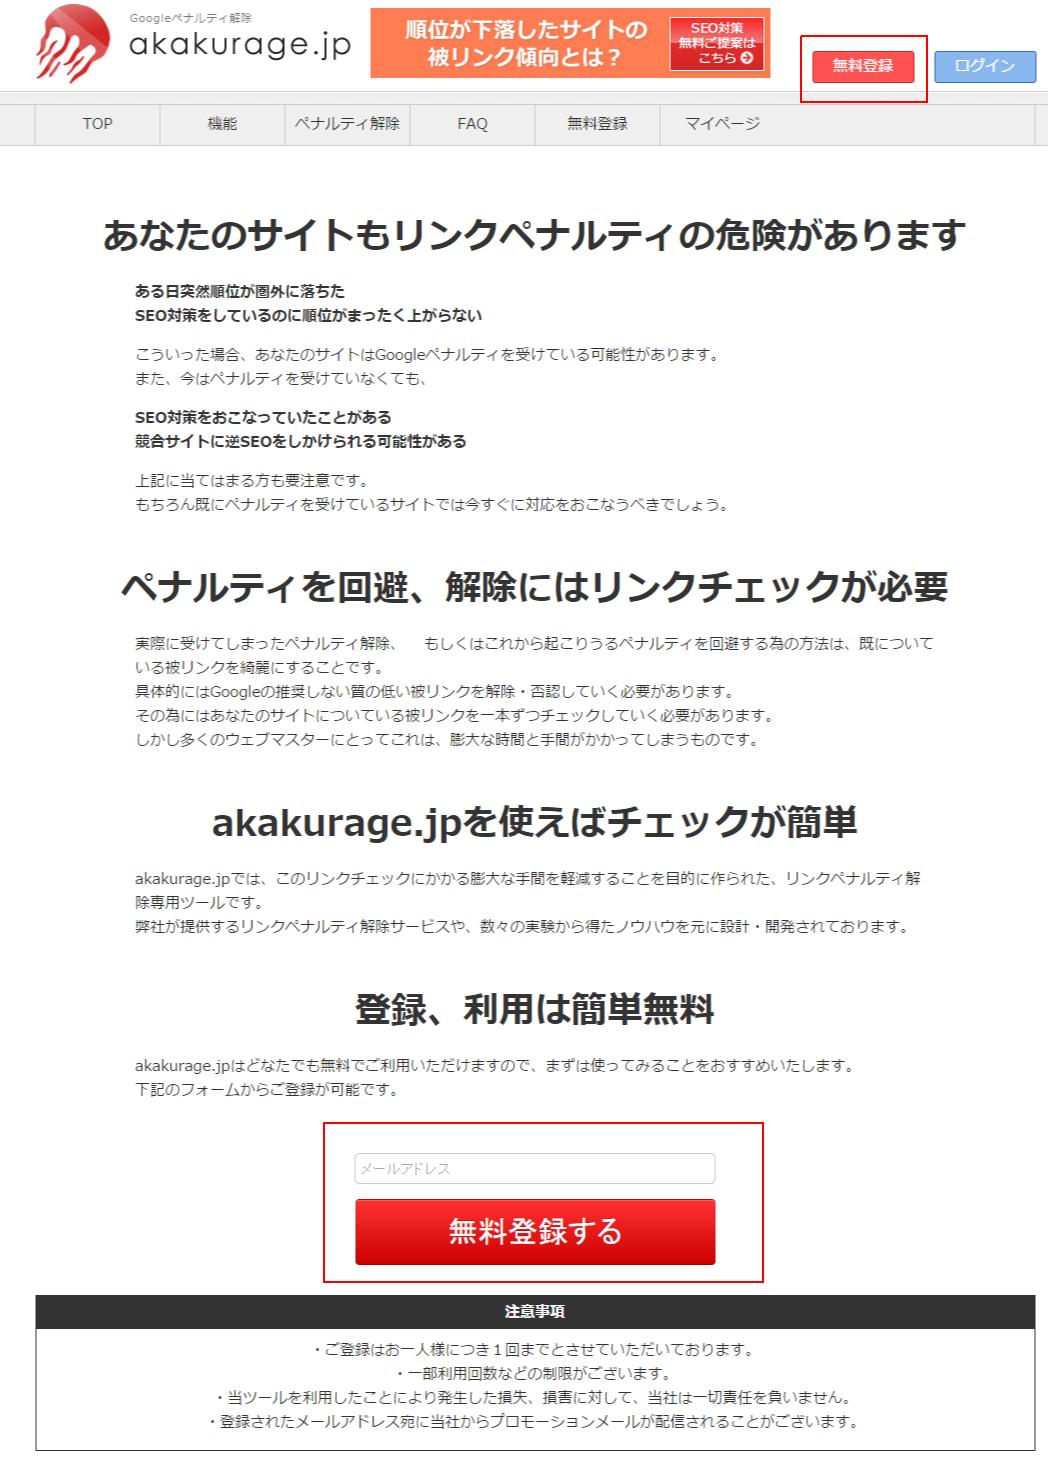 Googleペナルティ解除 akakurage.jp登録